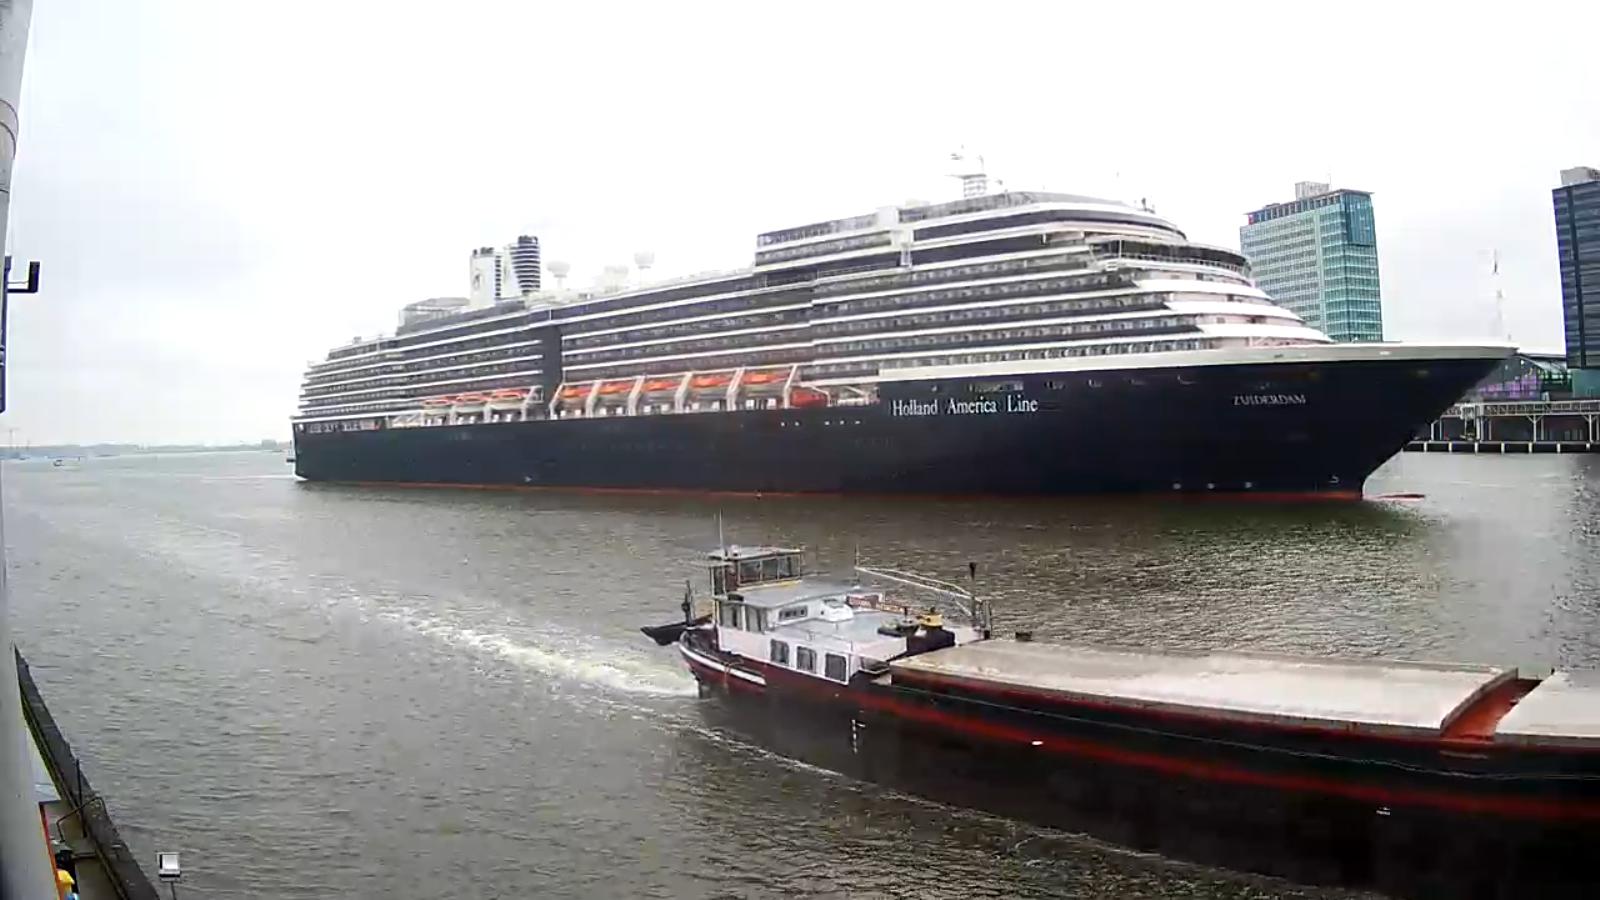 Cruise ship Zuiderdam - Holland America Line